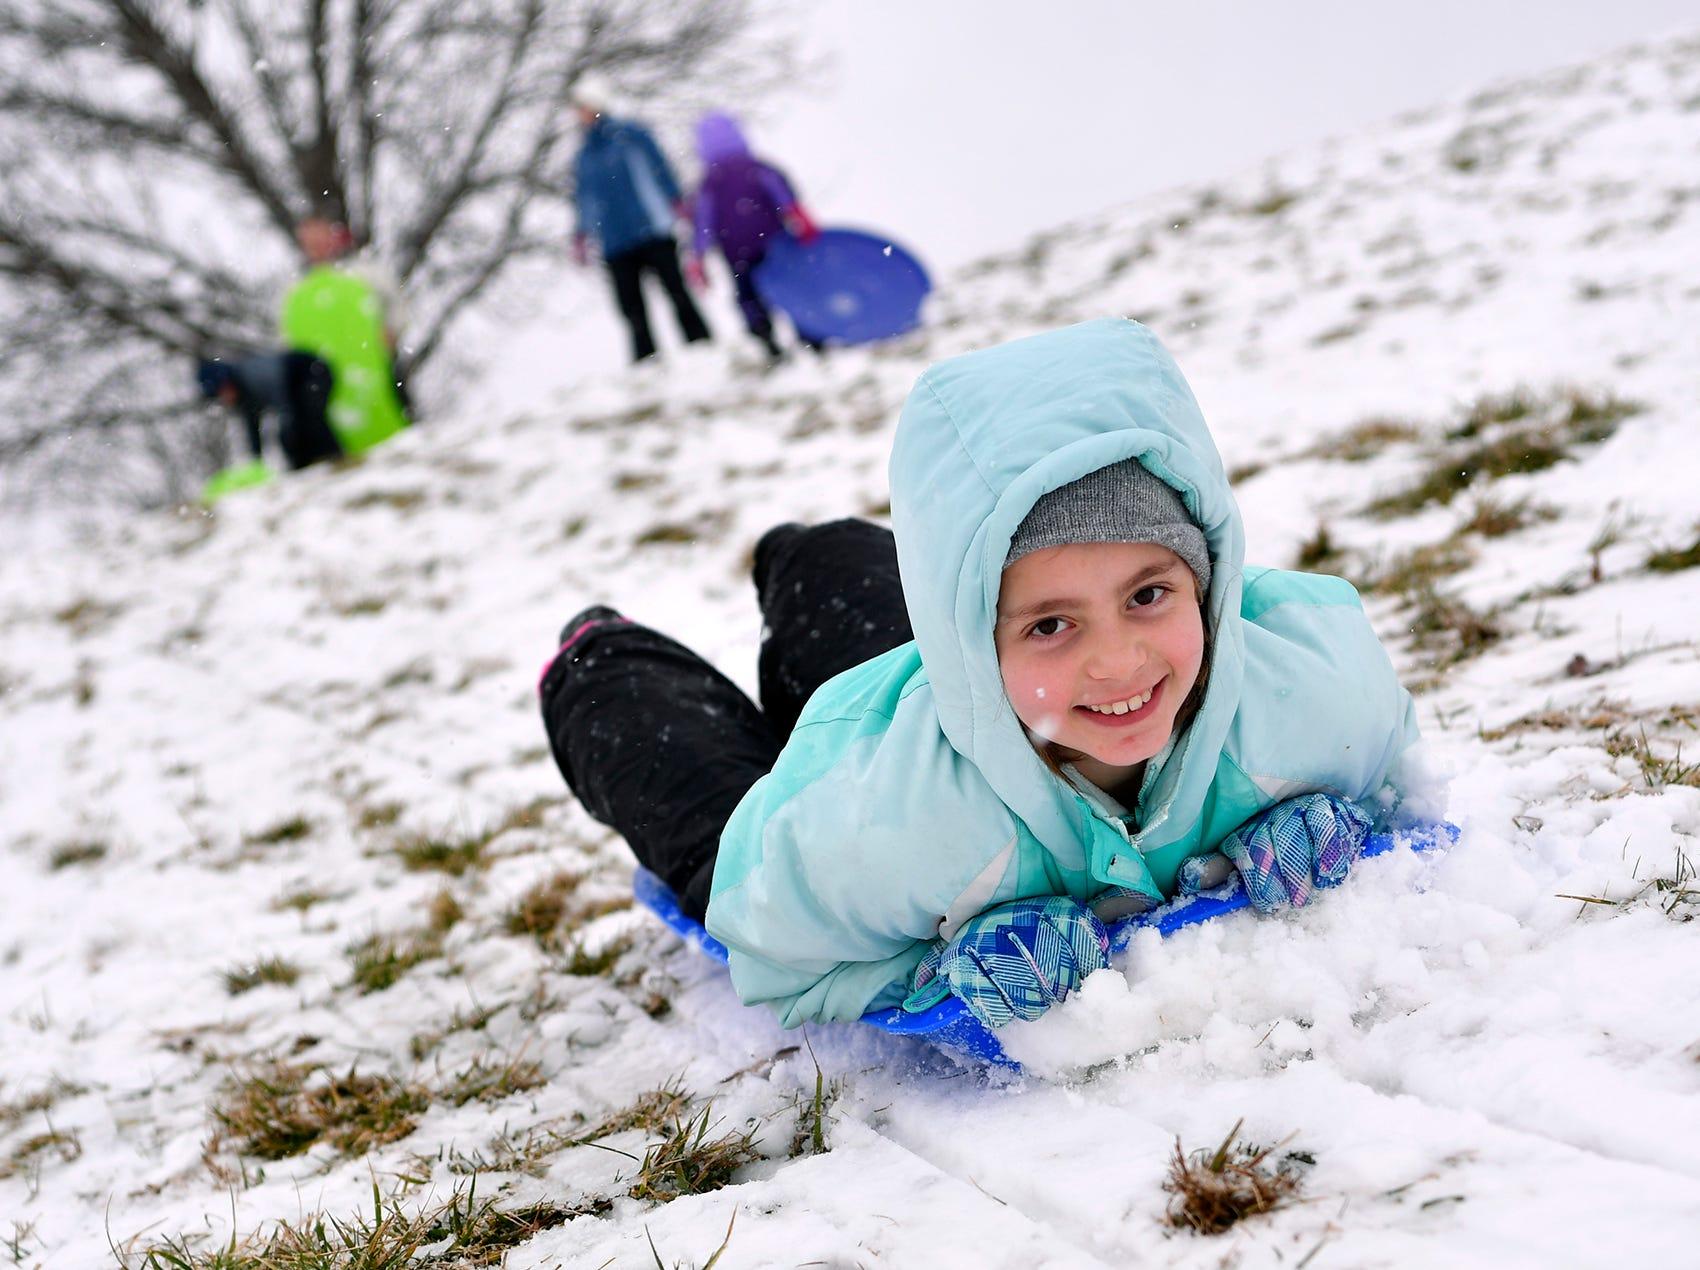 Katelyn Shiffer, 9, enjoys a snow day at Springettsbury Park with her family, Monday, Feb. 11, 2019. John A. Pavoncello photo